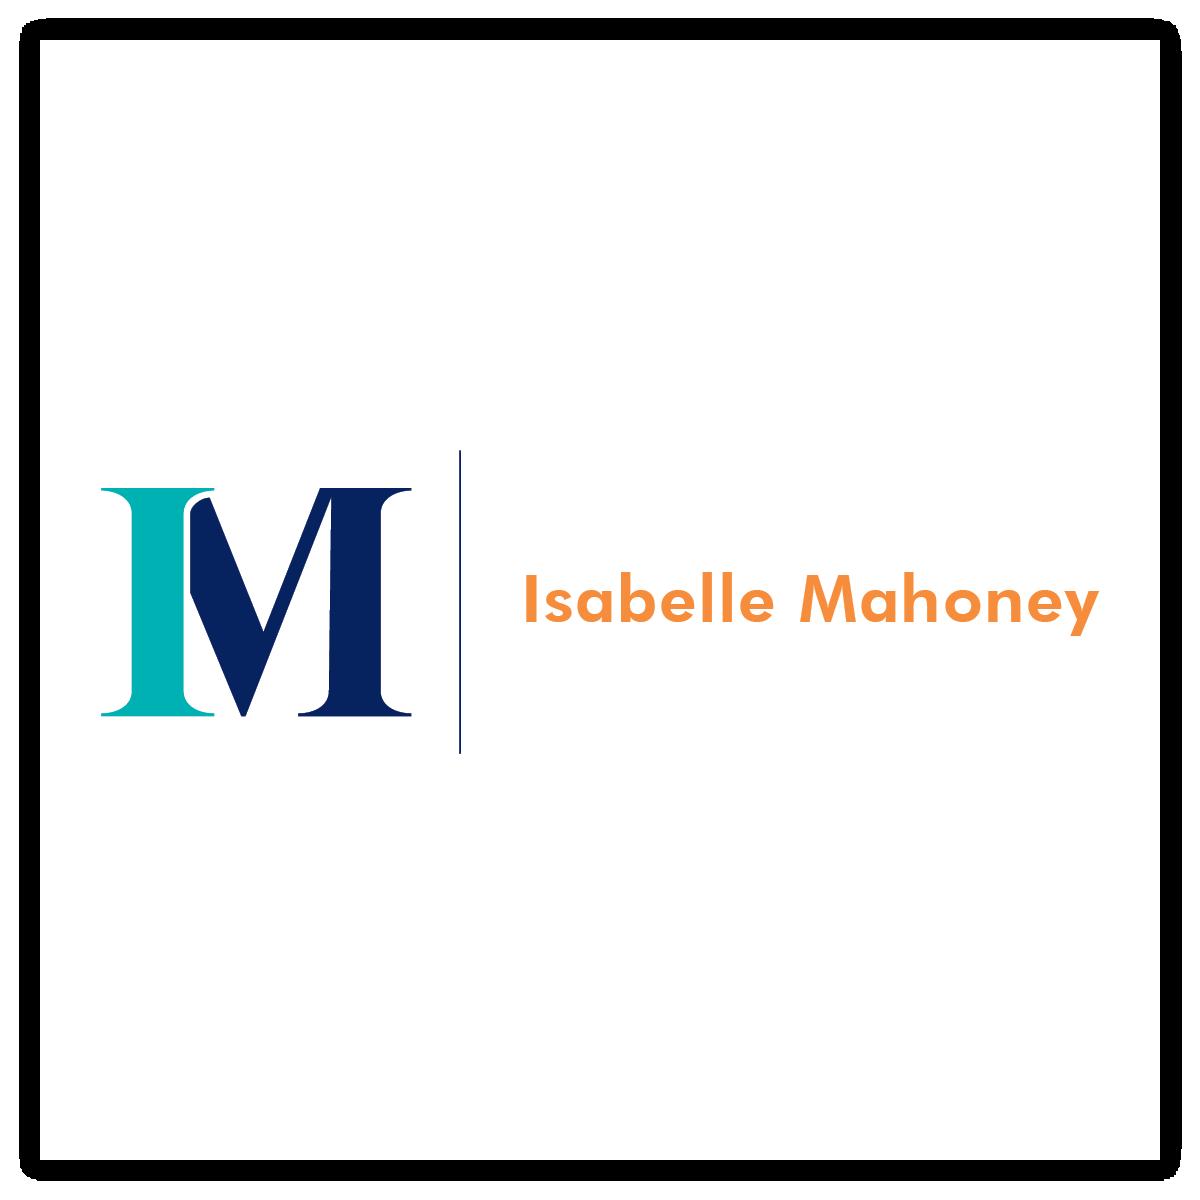 Logo Images8.png